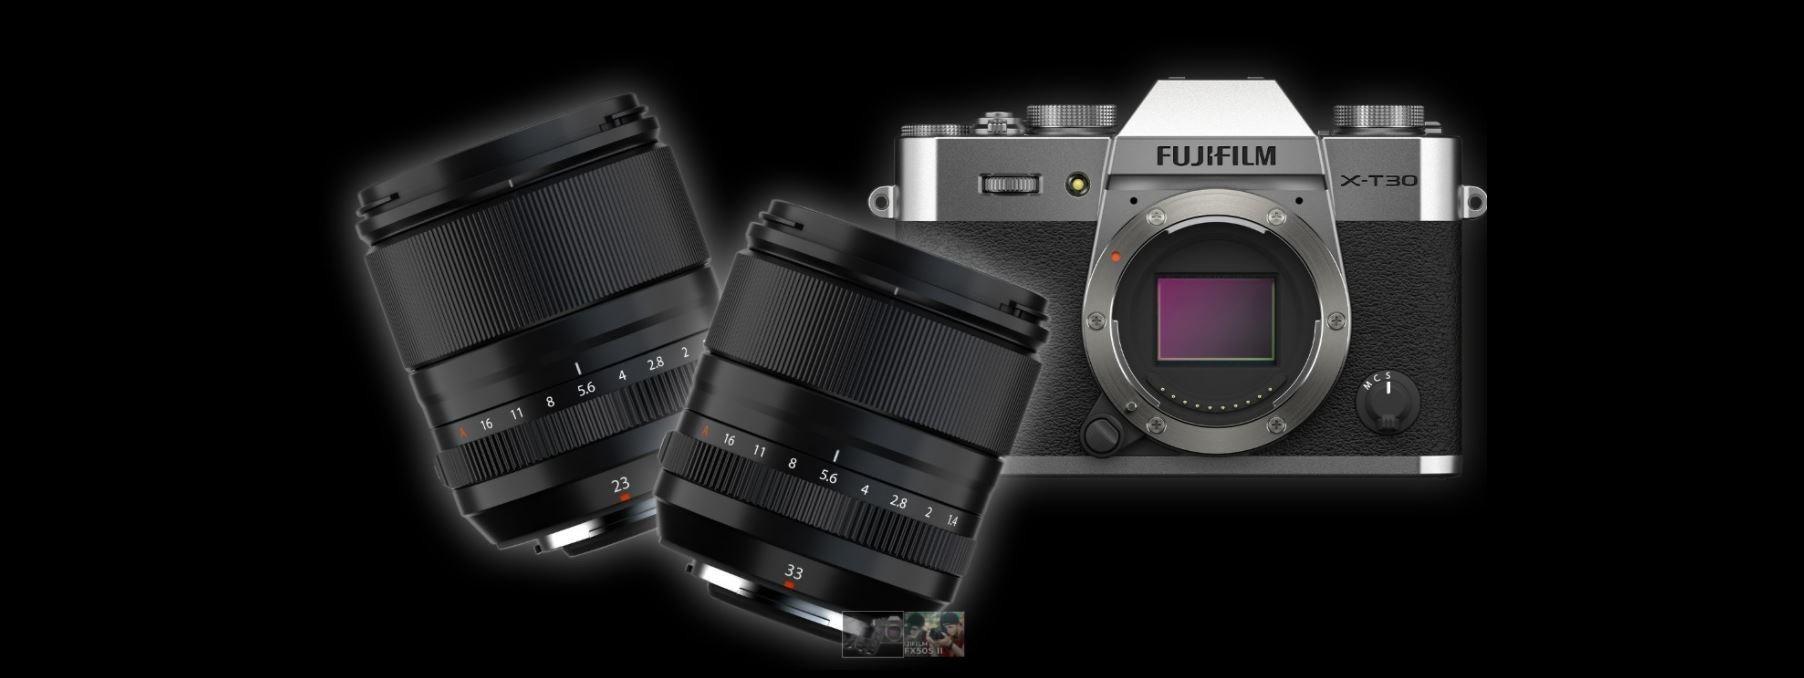 FUJIFILM Announces GFX 50S II Medium Format Camera along with XF 23mm, 33mm Lenses and X-T30 II Mirrorless Camera